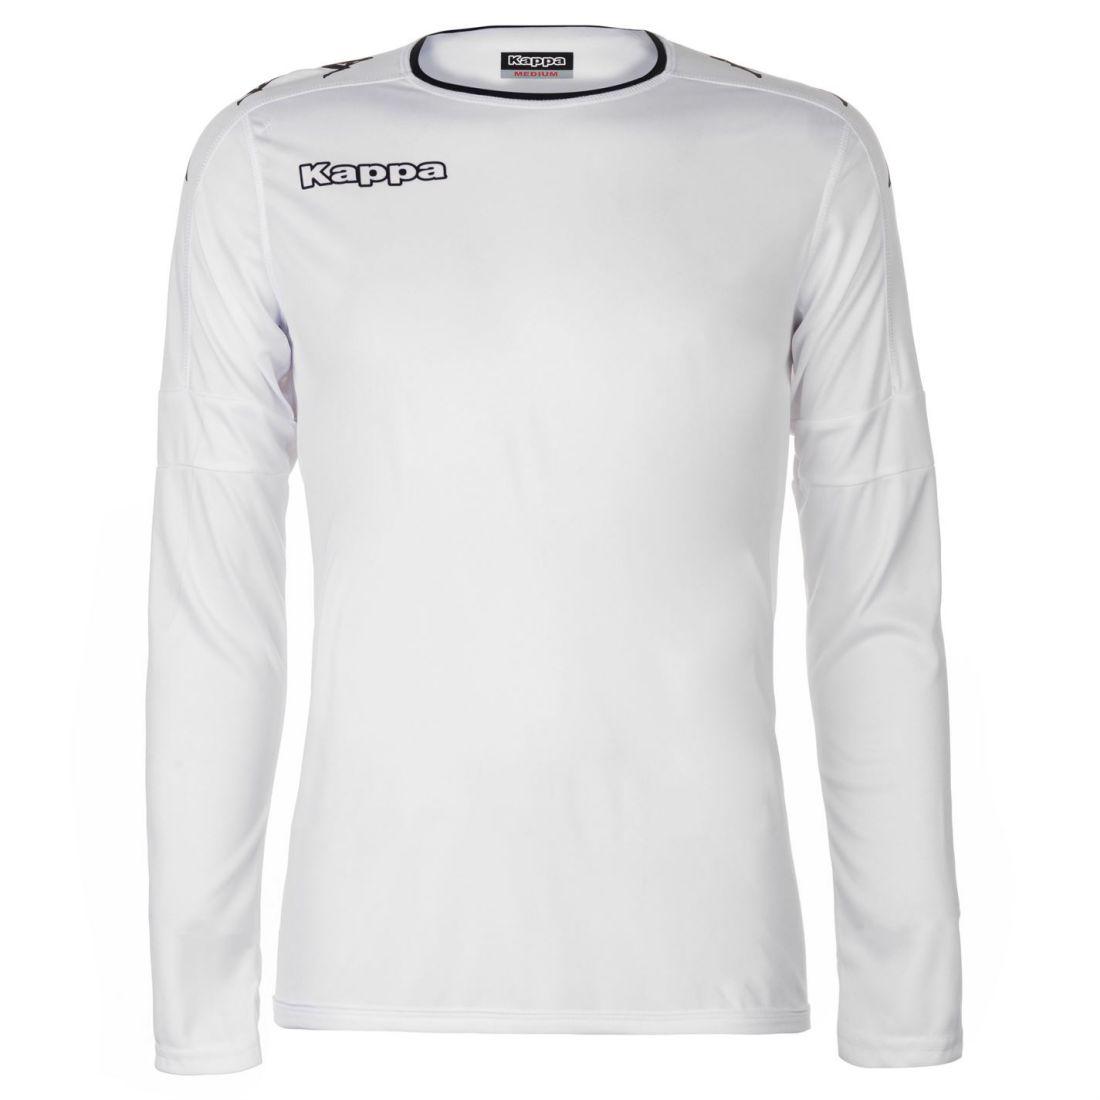 8e19d0b93d Kappa Santos Full Length Sleeve Top Mens Gents Crew Neck Shirt Round ...